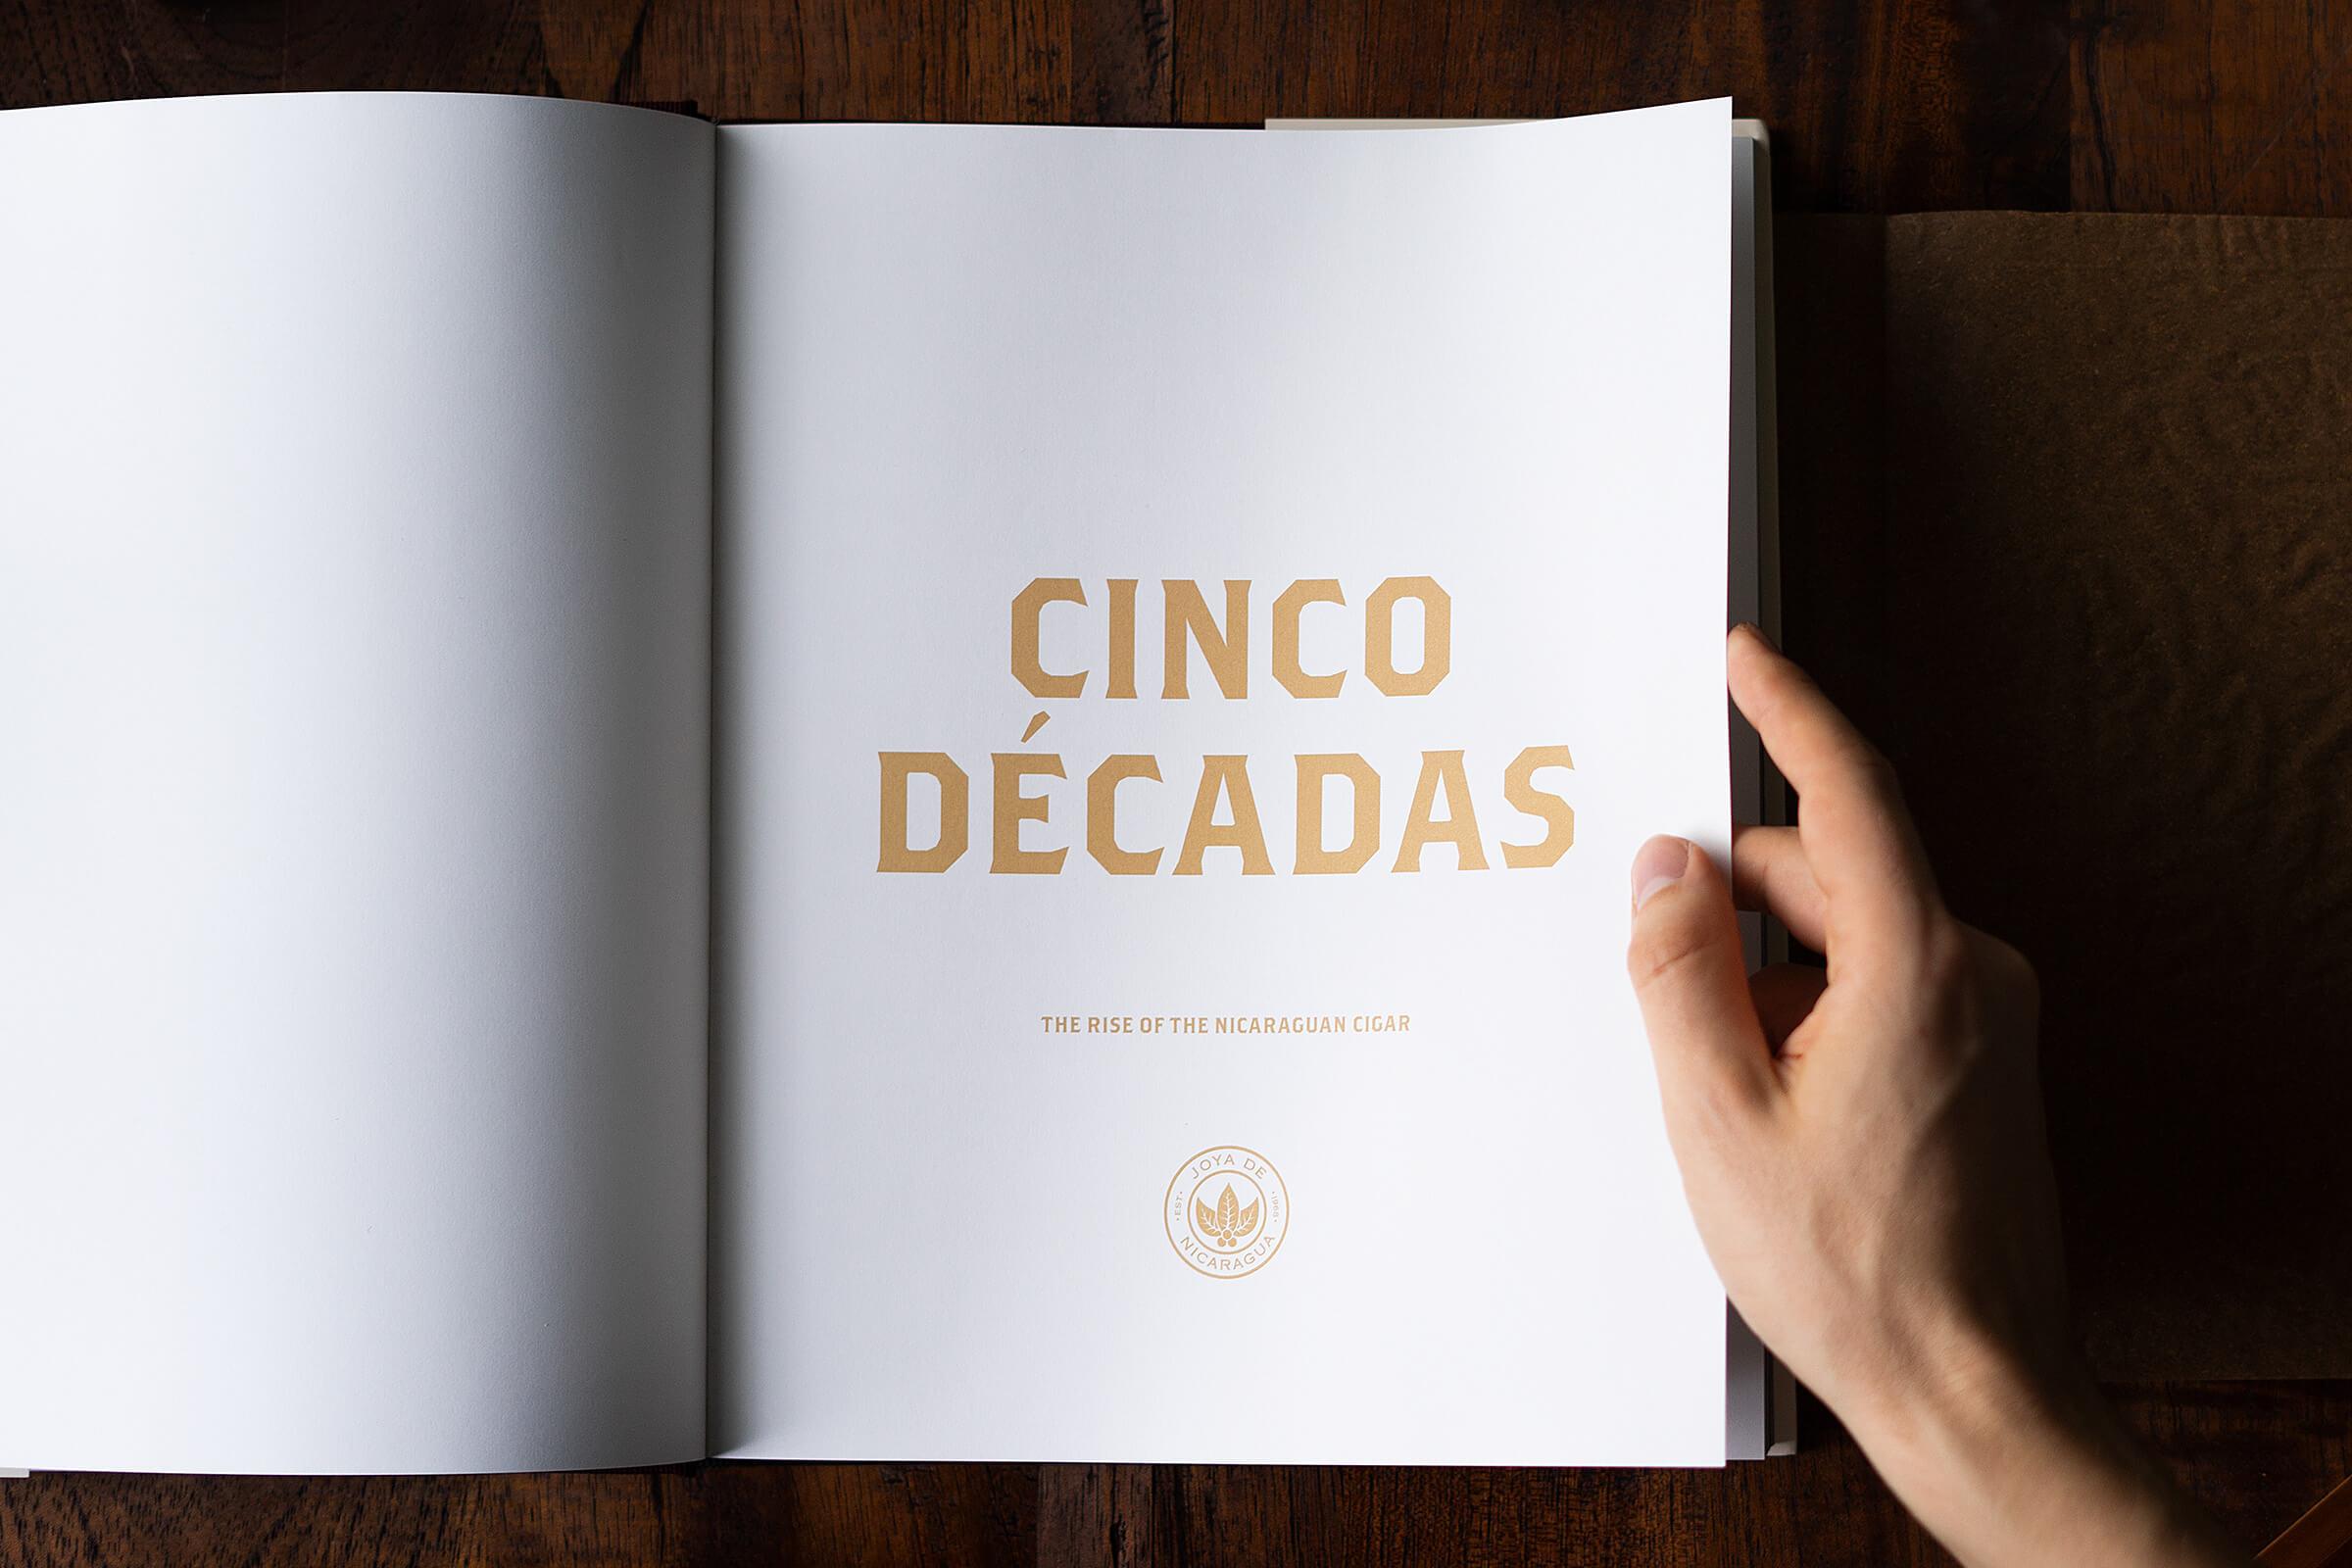 JDN_Cinco_Decadas_Book_Launch2